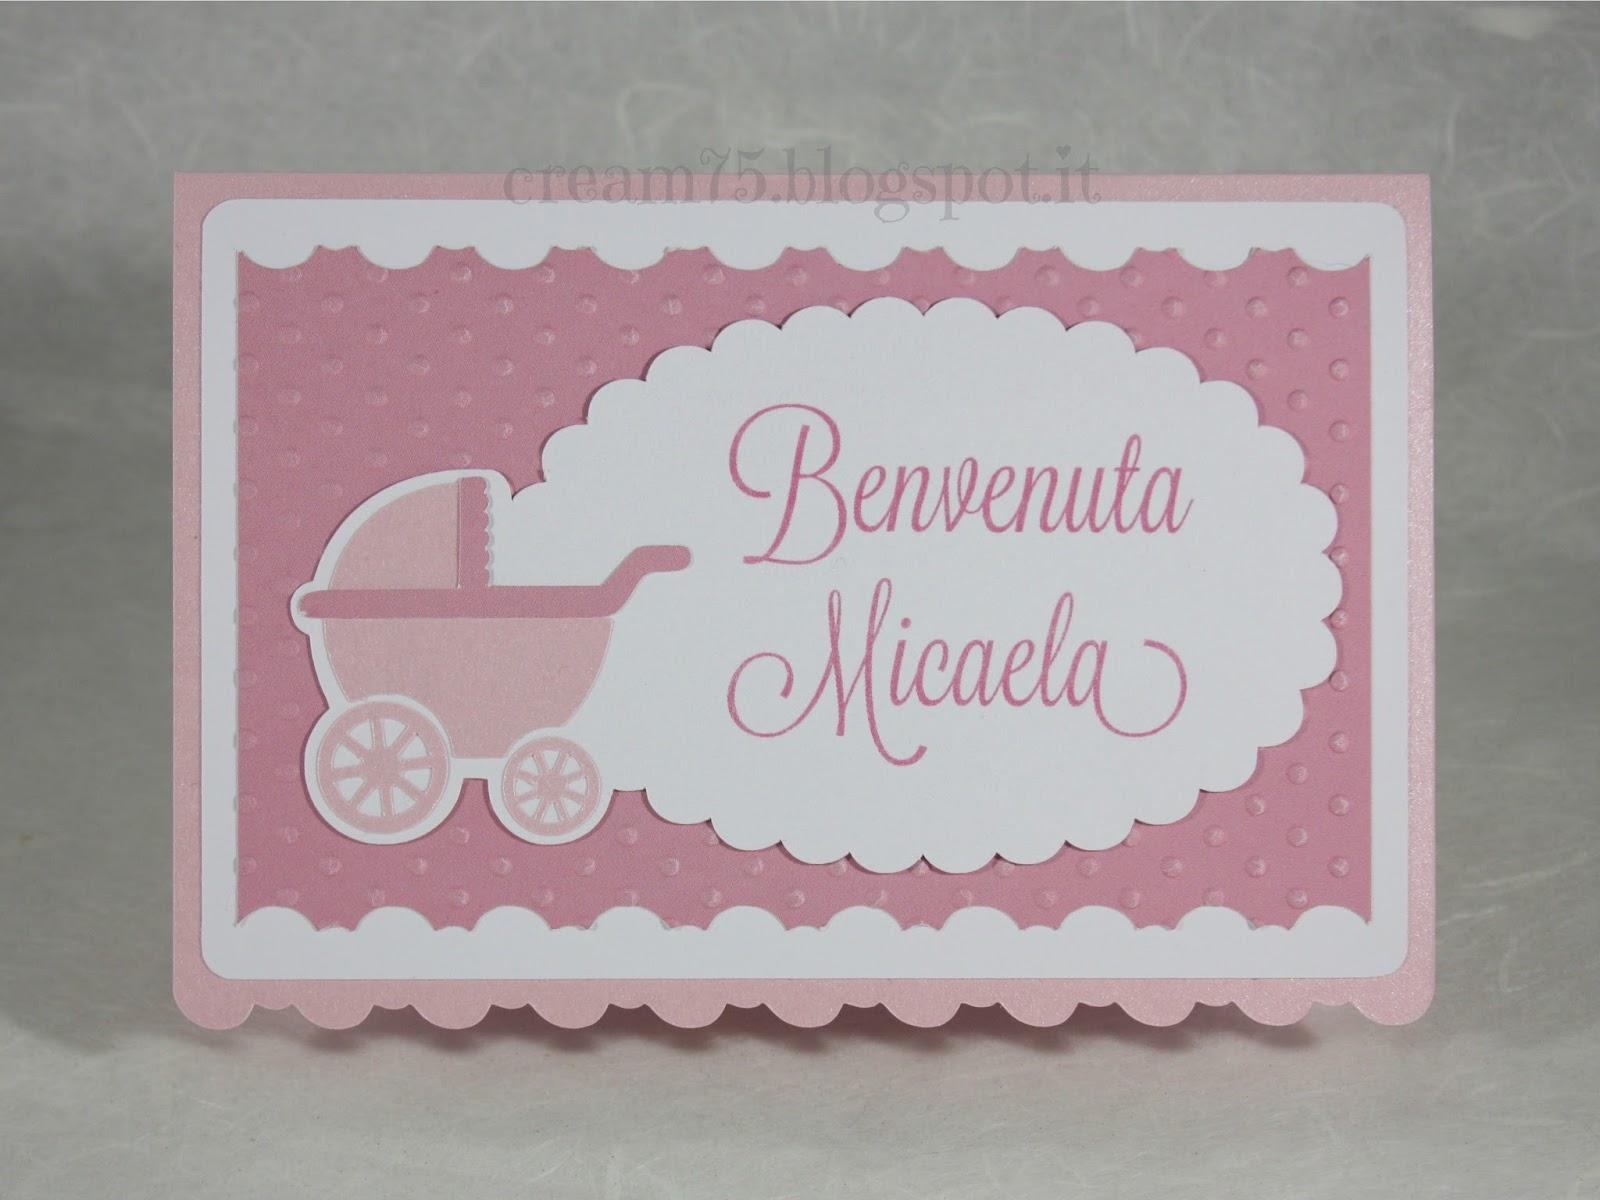 Eccezionale My Sweet Blog: Biglietto di auguri per la nascita di una bimba II66